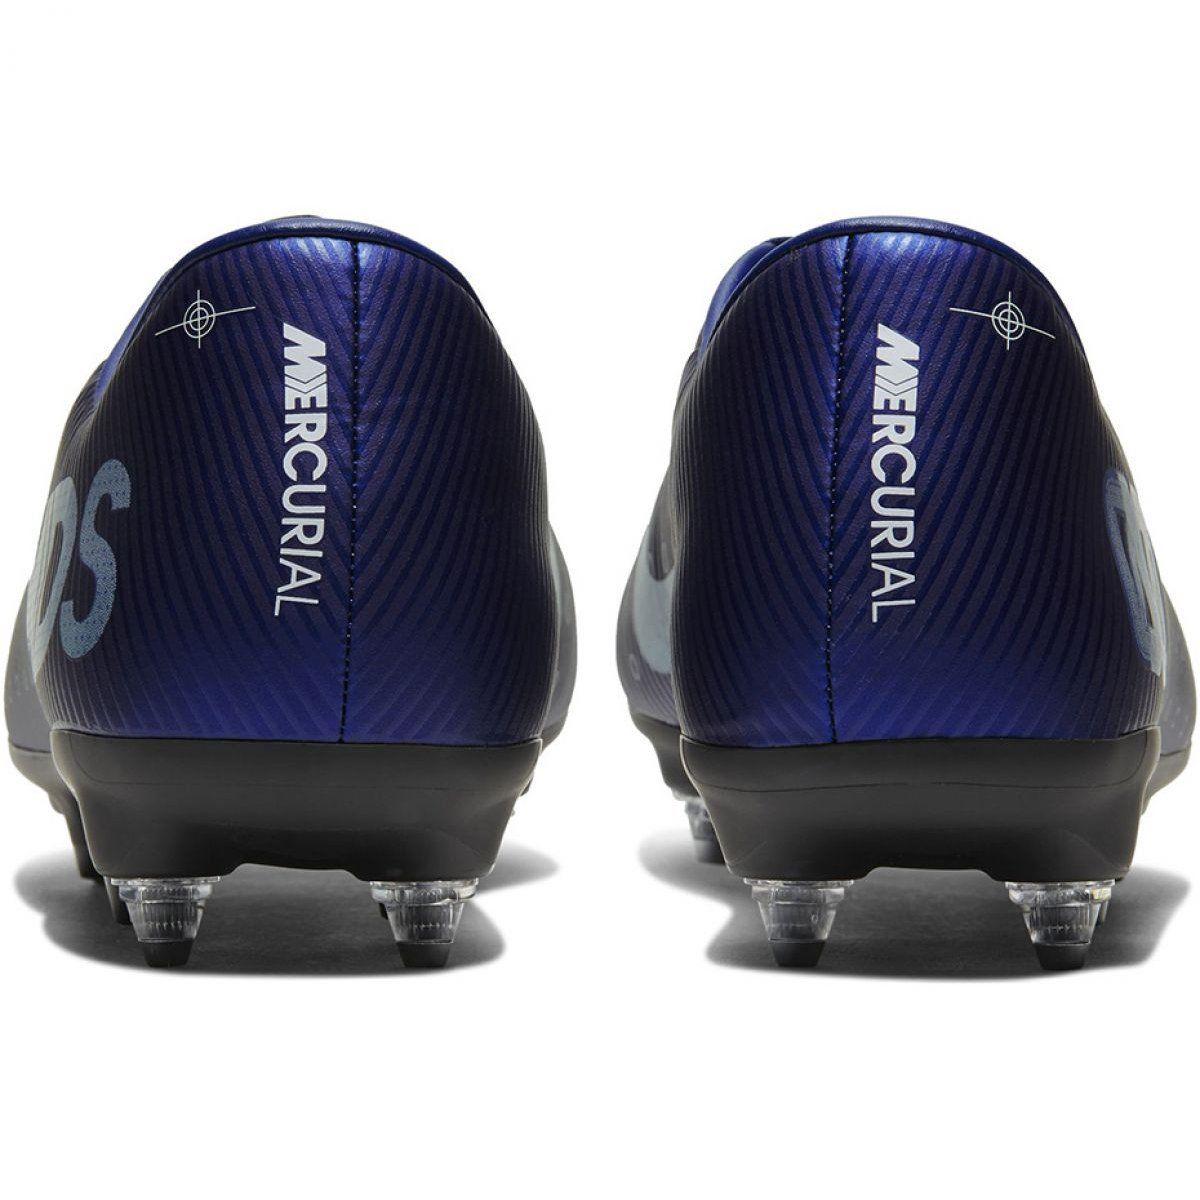 Buty Pilkarskie Nike Mercurial Vapor 13 Academy Mds Sg Pro M Cj9986 401 Niebieskie Granatowe Football Shoes Football Boots Shoe Feature